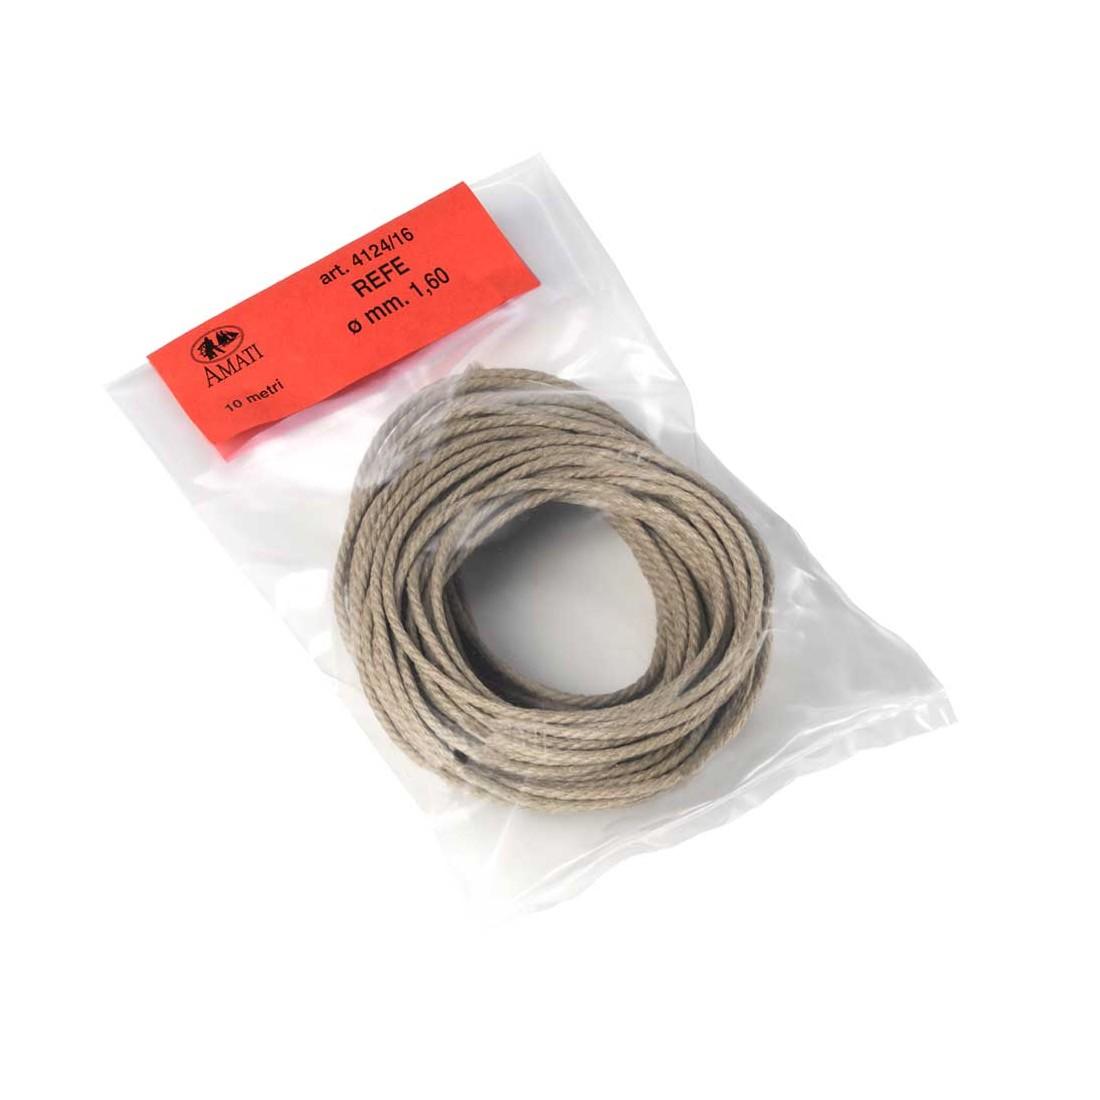 Rope mm.1,60  10 mt.